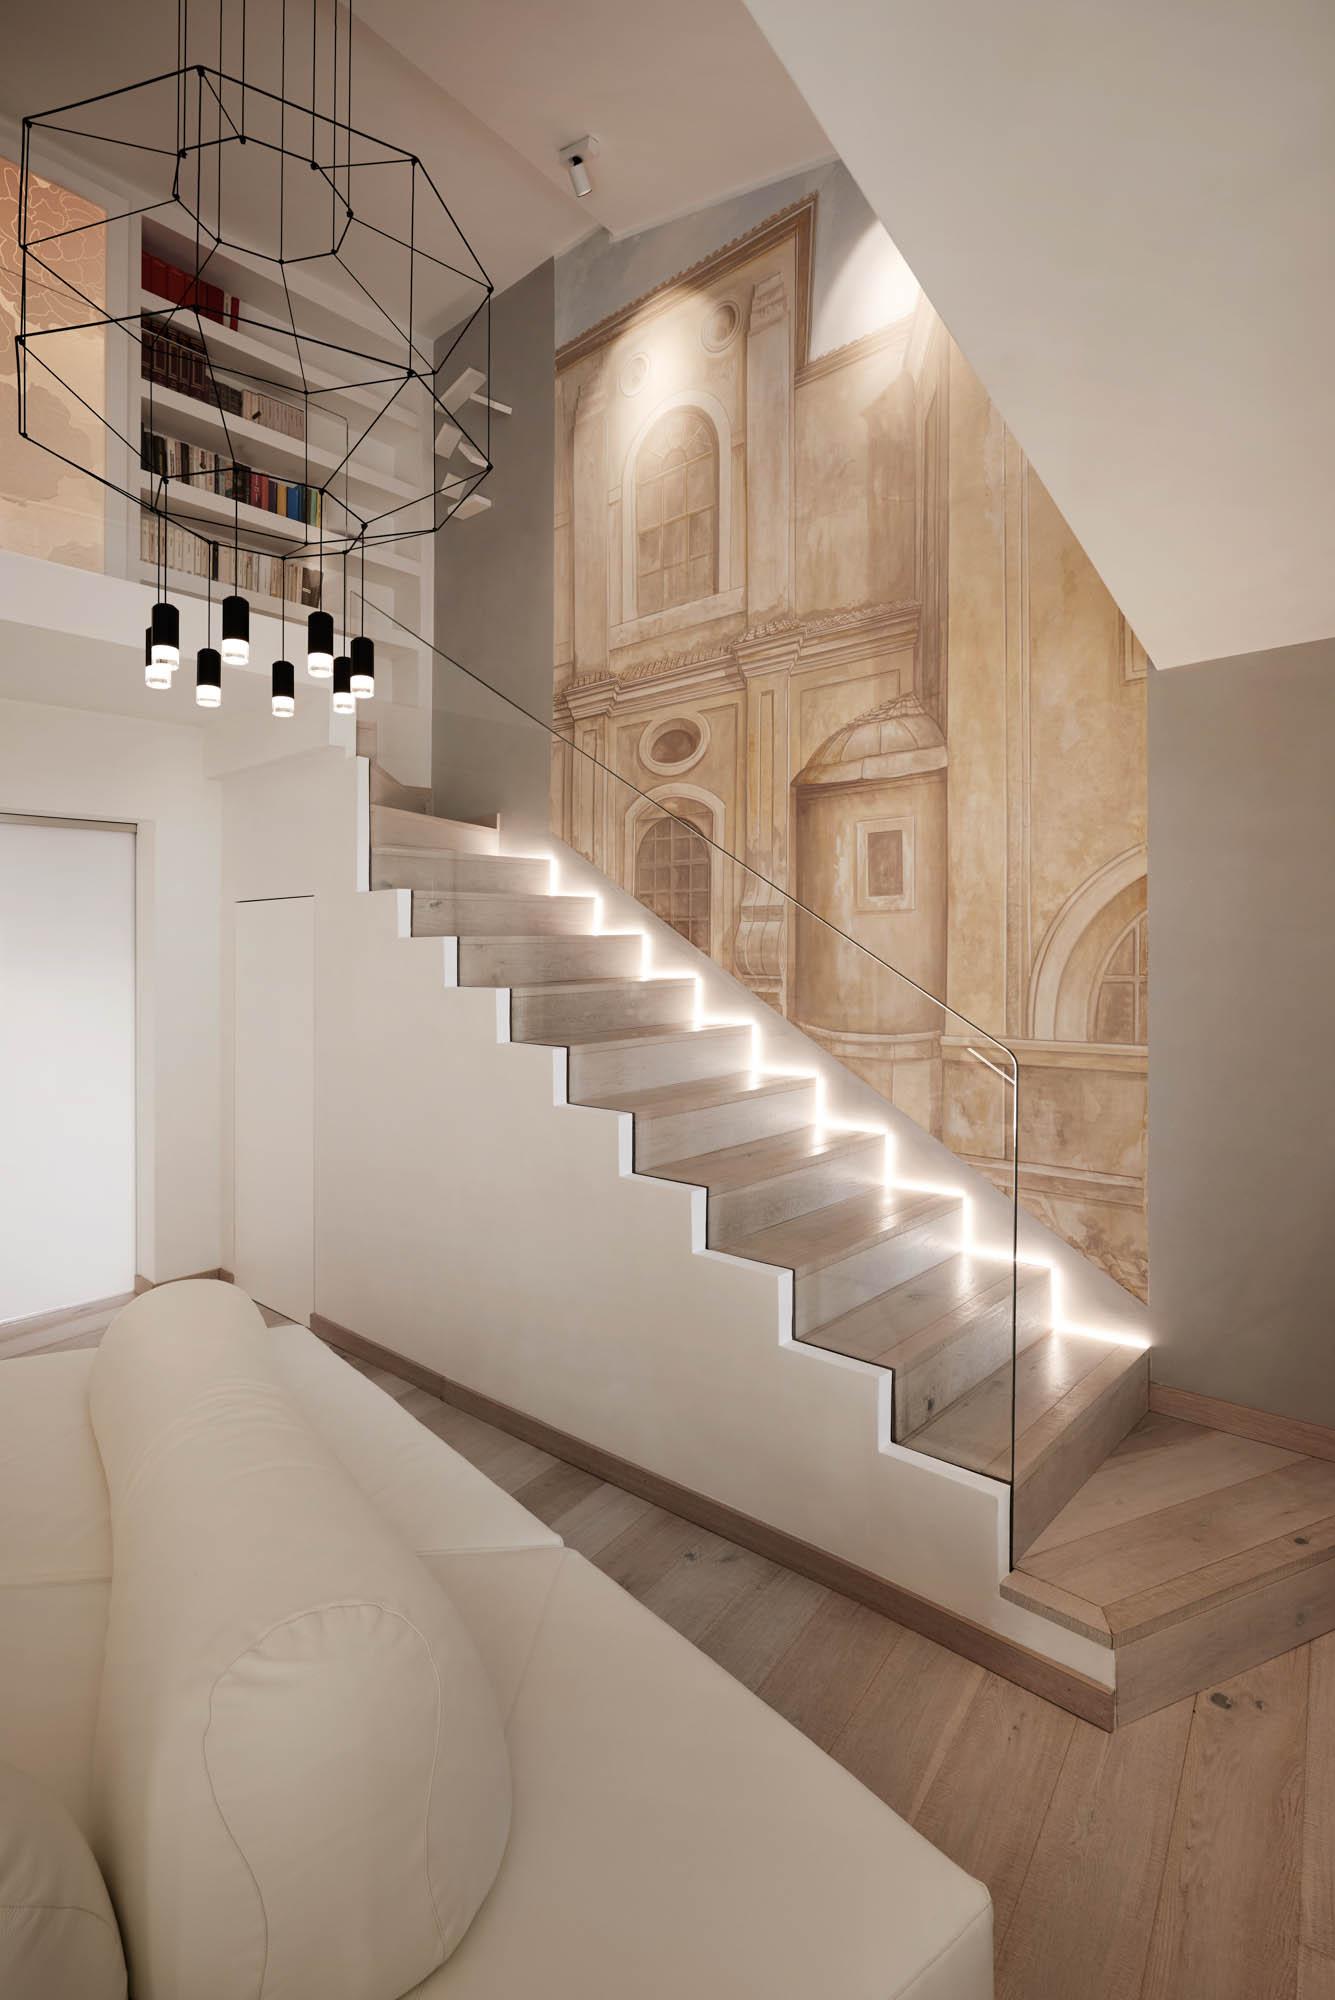 04_stair2